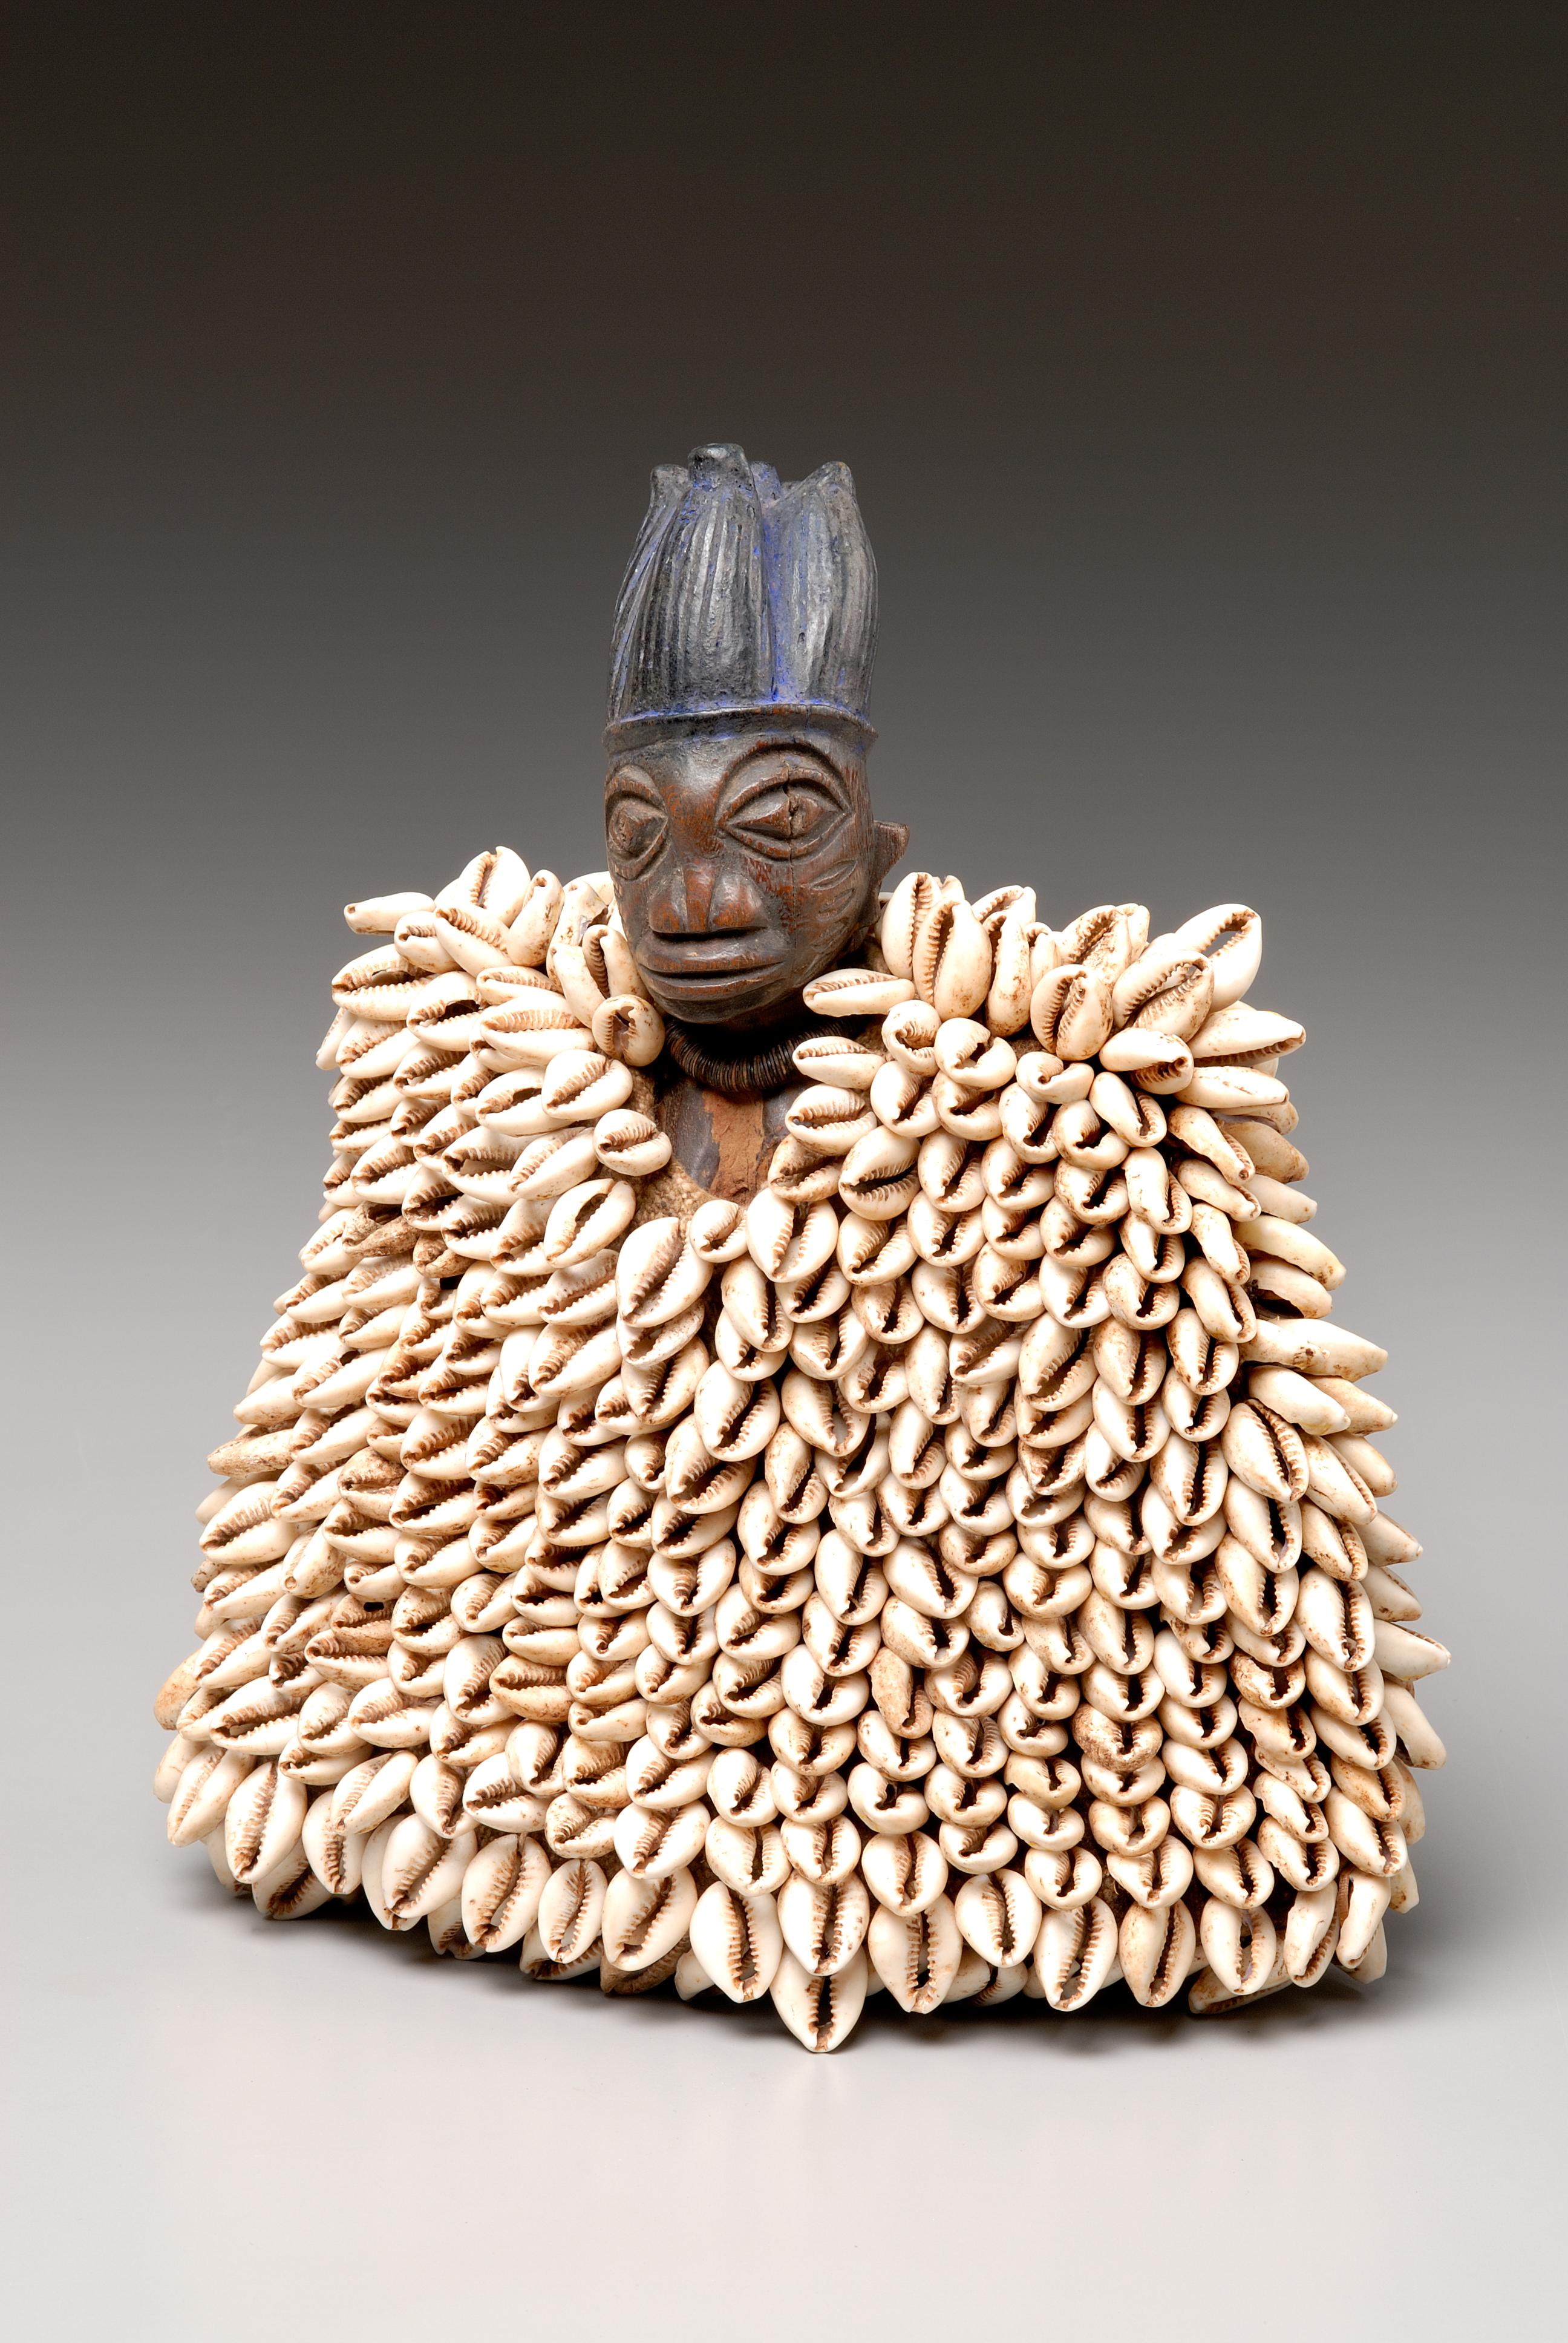 Past exhibitions u2013 nsu art museum fort lauderdale